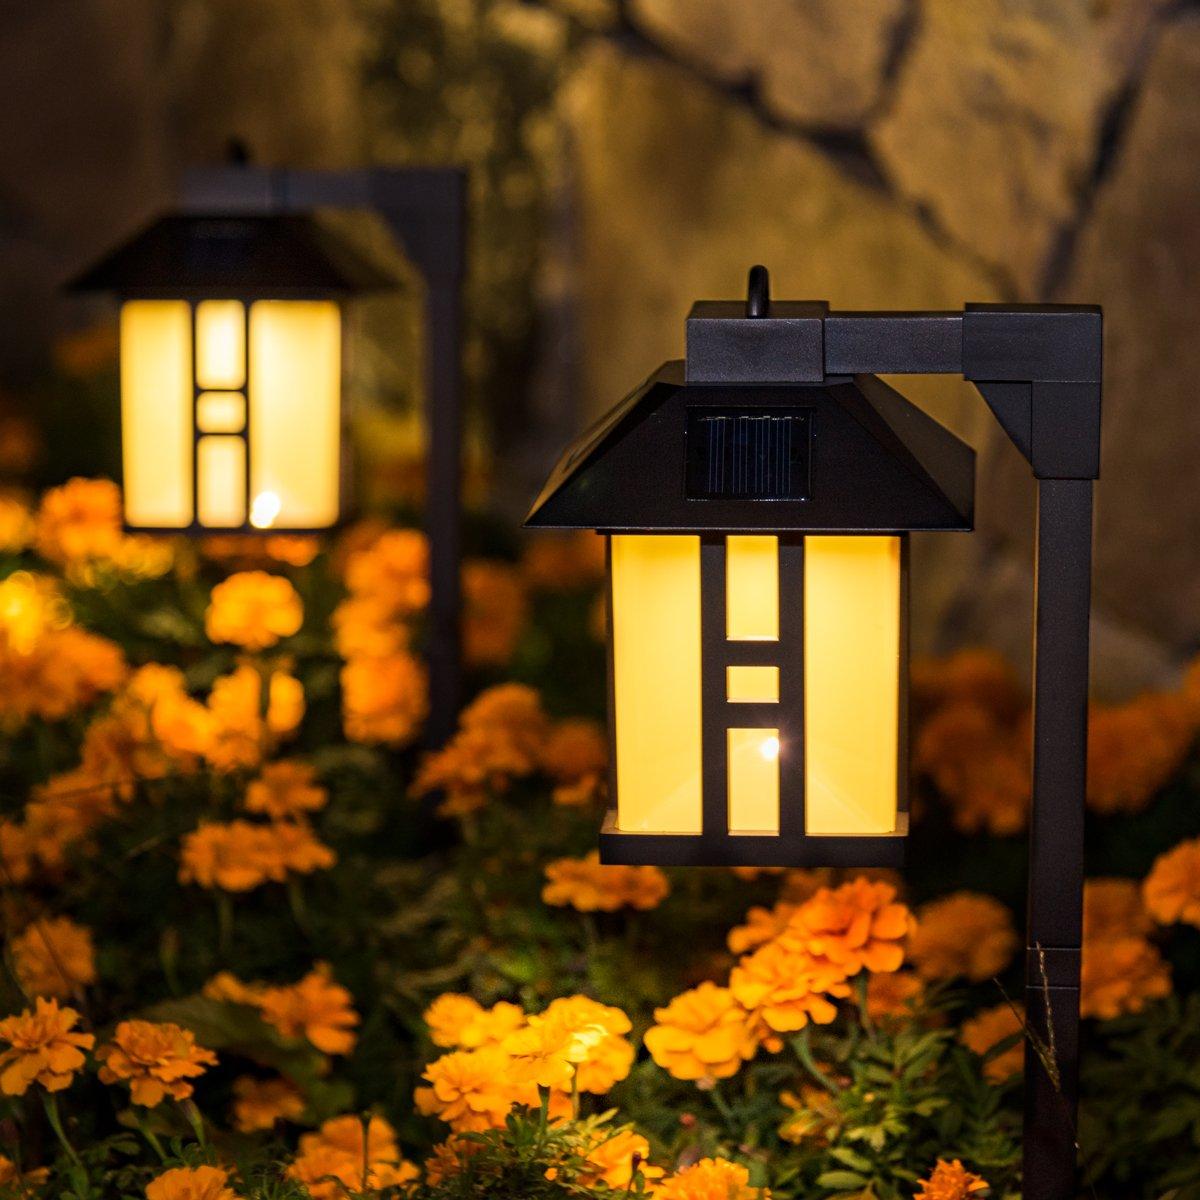 Landscape Lighting Kit Solar Powered Walkway Lights: Best Rated In Landscape Lighting & Accessories & Helpful